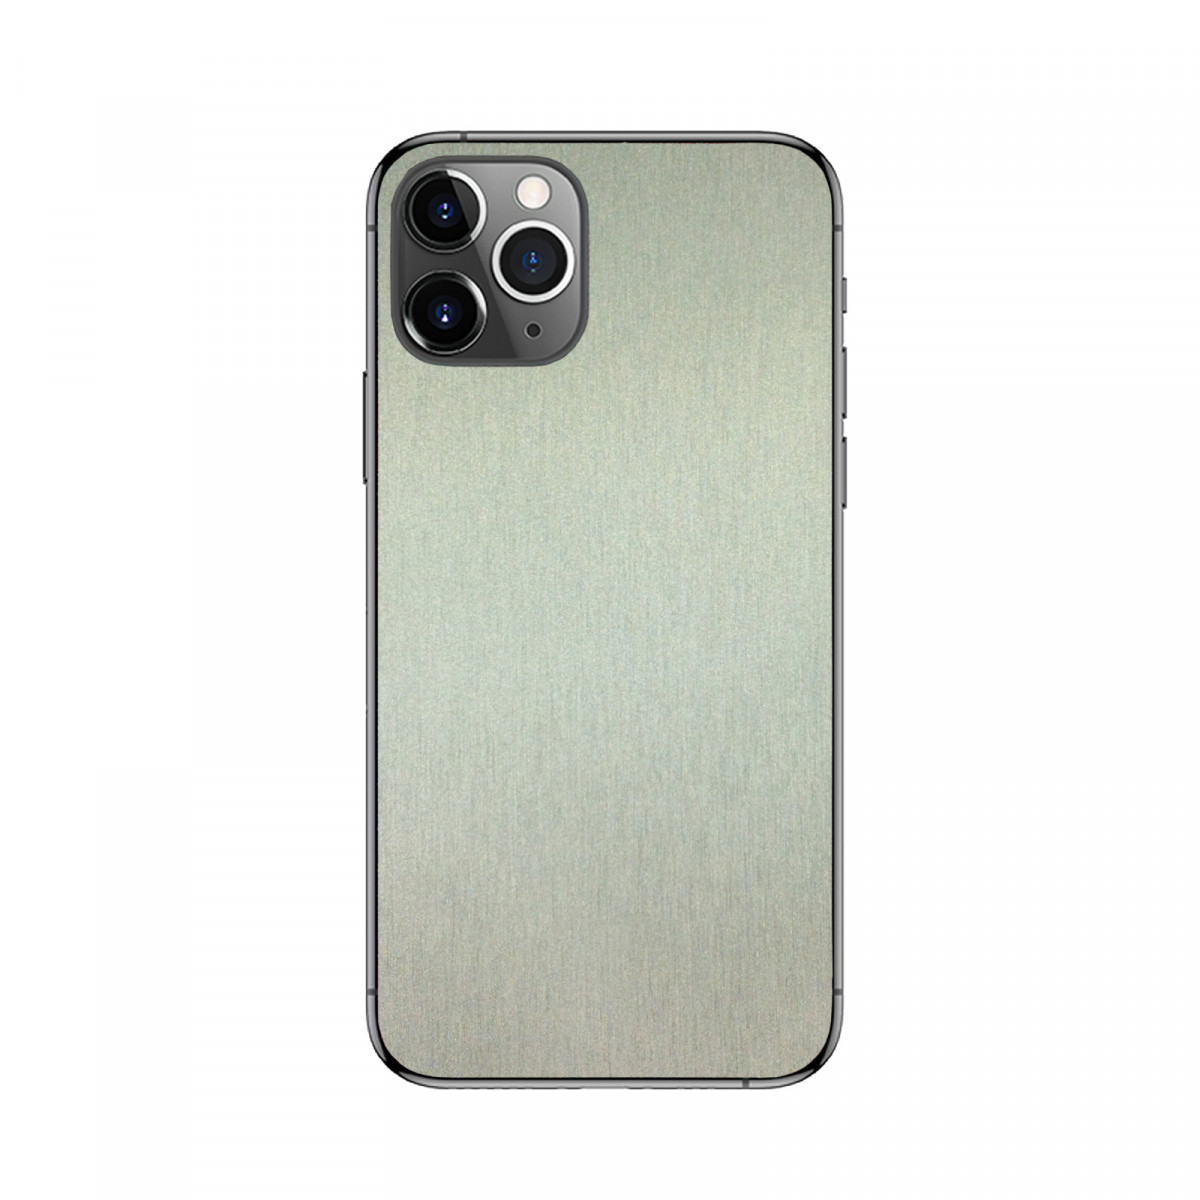 Защитная пленка на заднюю крышку смартфона Светло-серый Металик